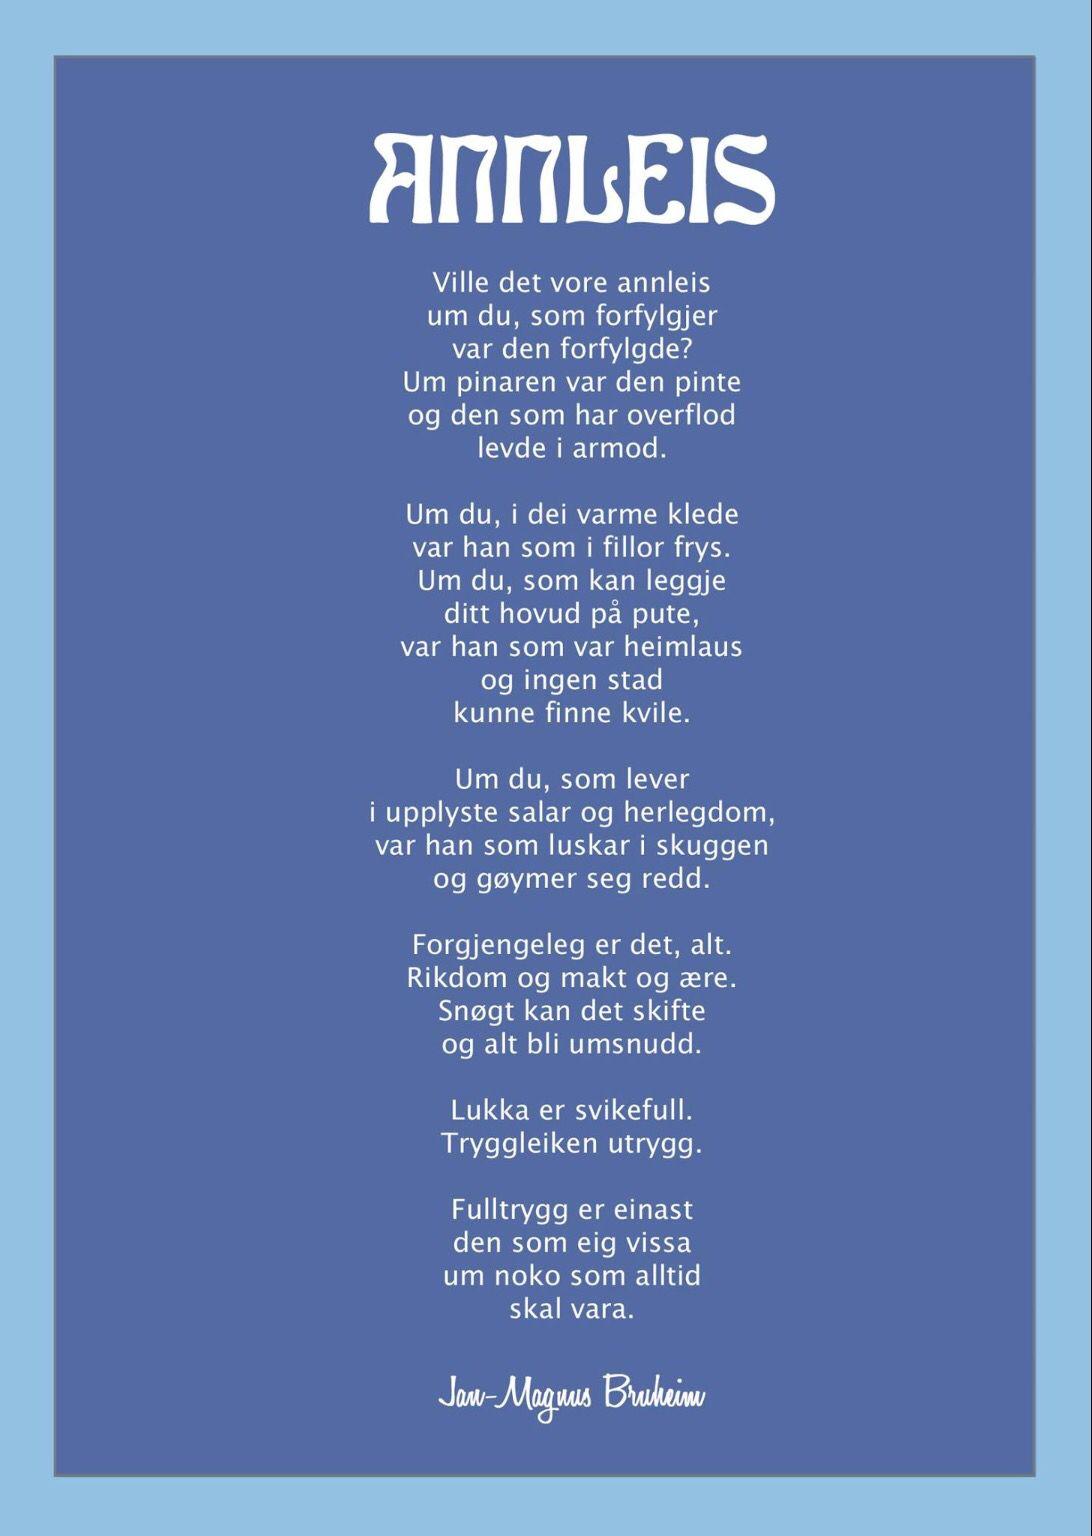 rolig 50 års dikt Jan Magnus Bruheim dikt | GODE ORD | Pinterest | Poem rolig 50 års dikt